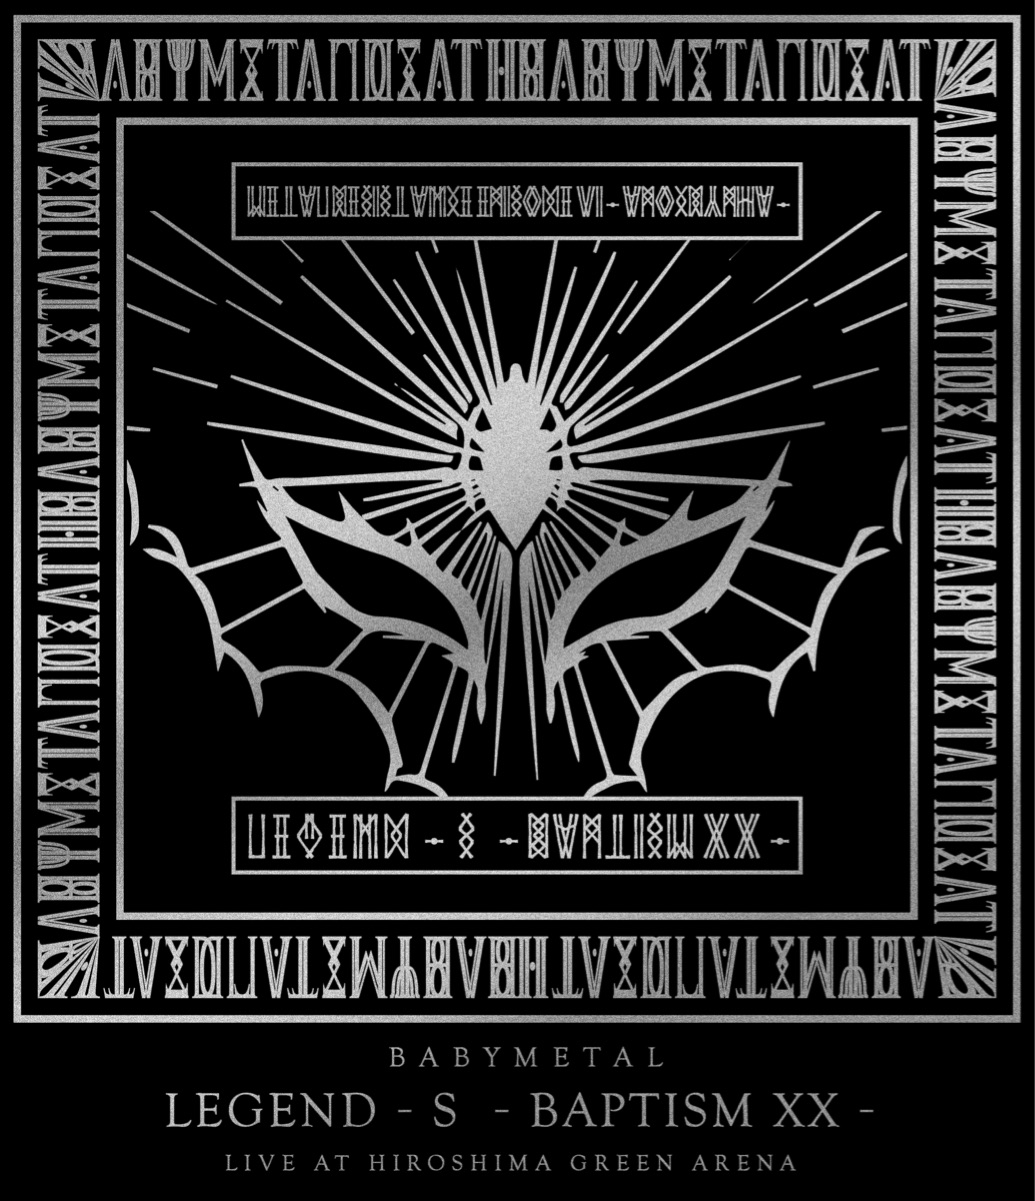 BABYMETAL、SU-METAL の広島凱旋公演・映像作品「LEGEND – S – BAPTISM XX -」リリースが決定